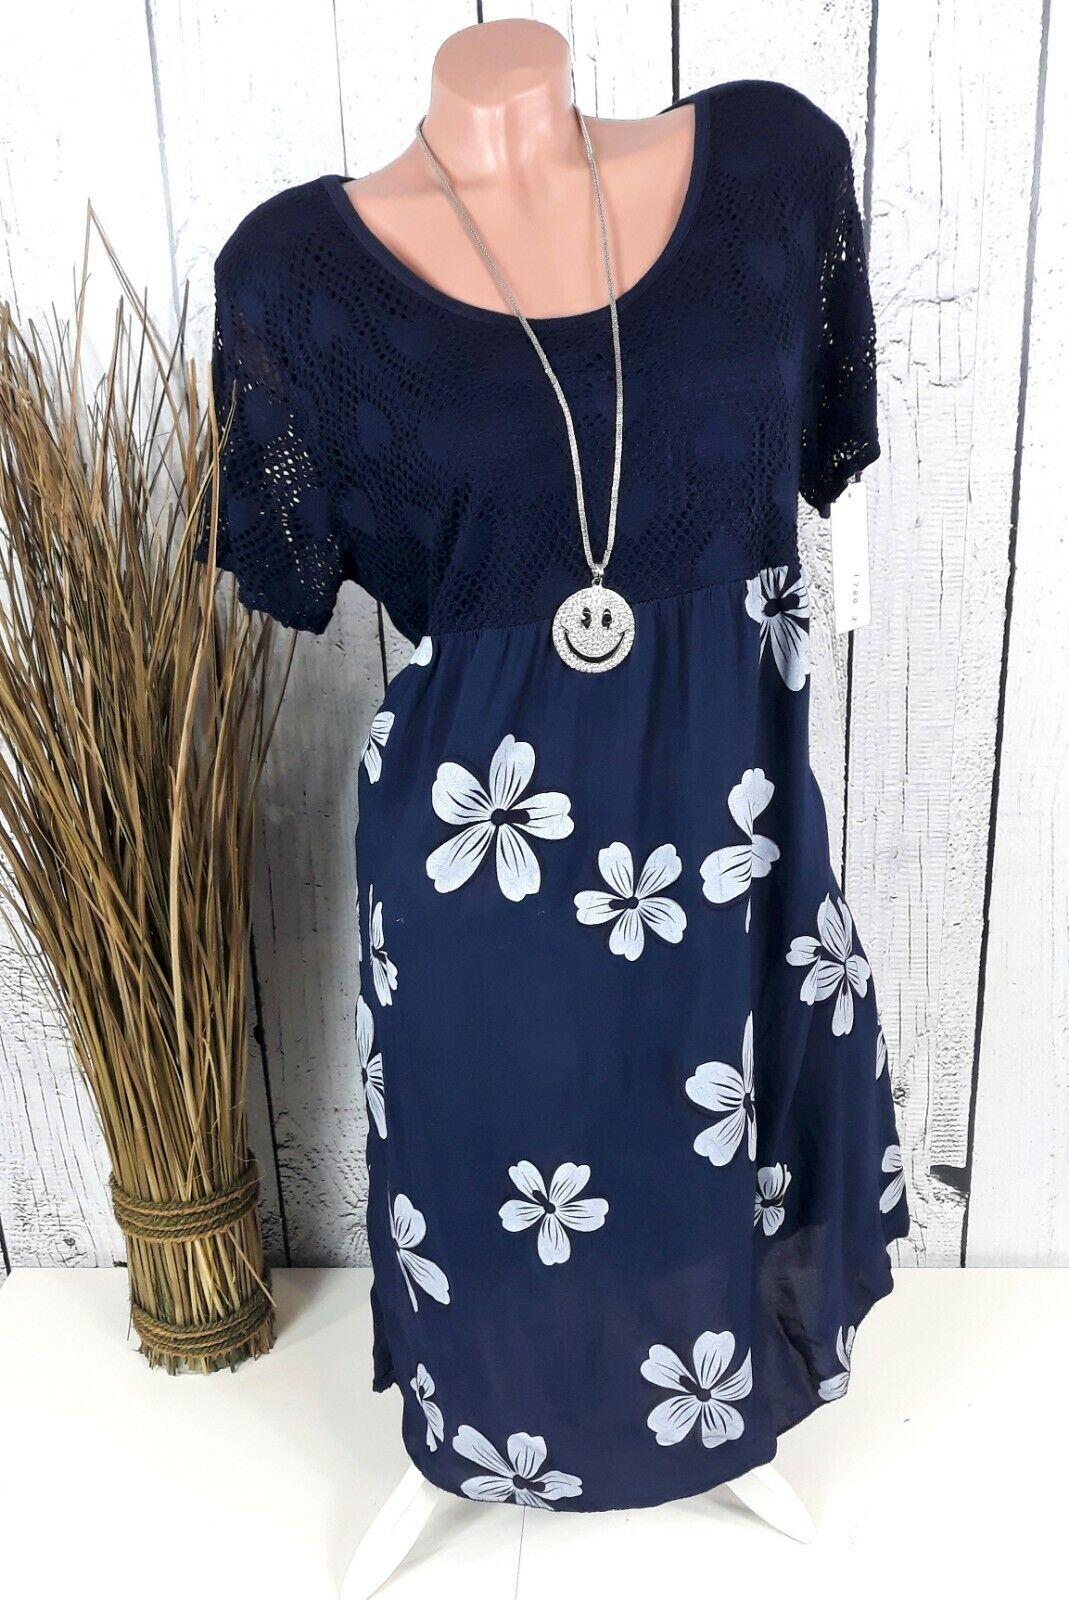 Italia Moda Sommerkleid Tunika Kleid geblümt in dunkel blau Gr. 46 48